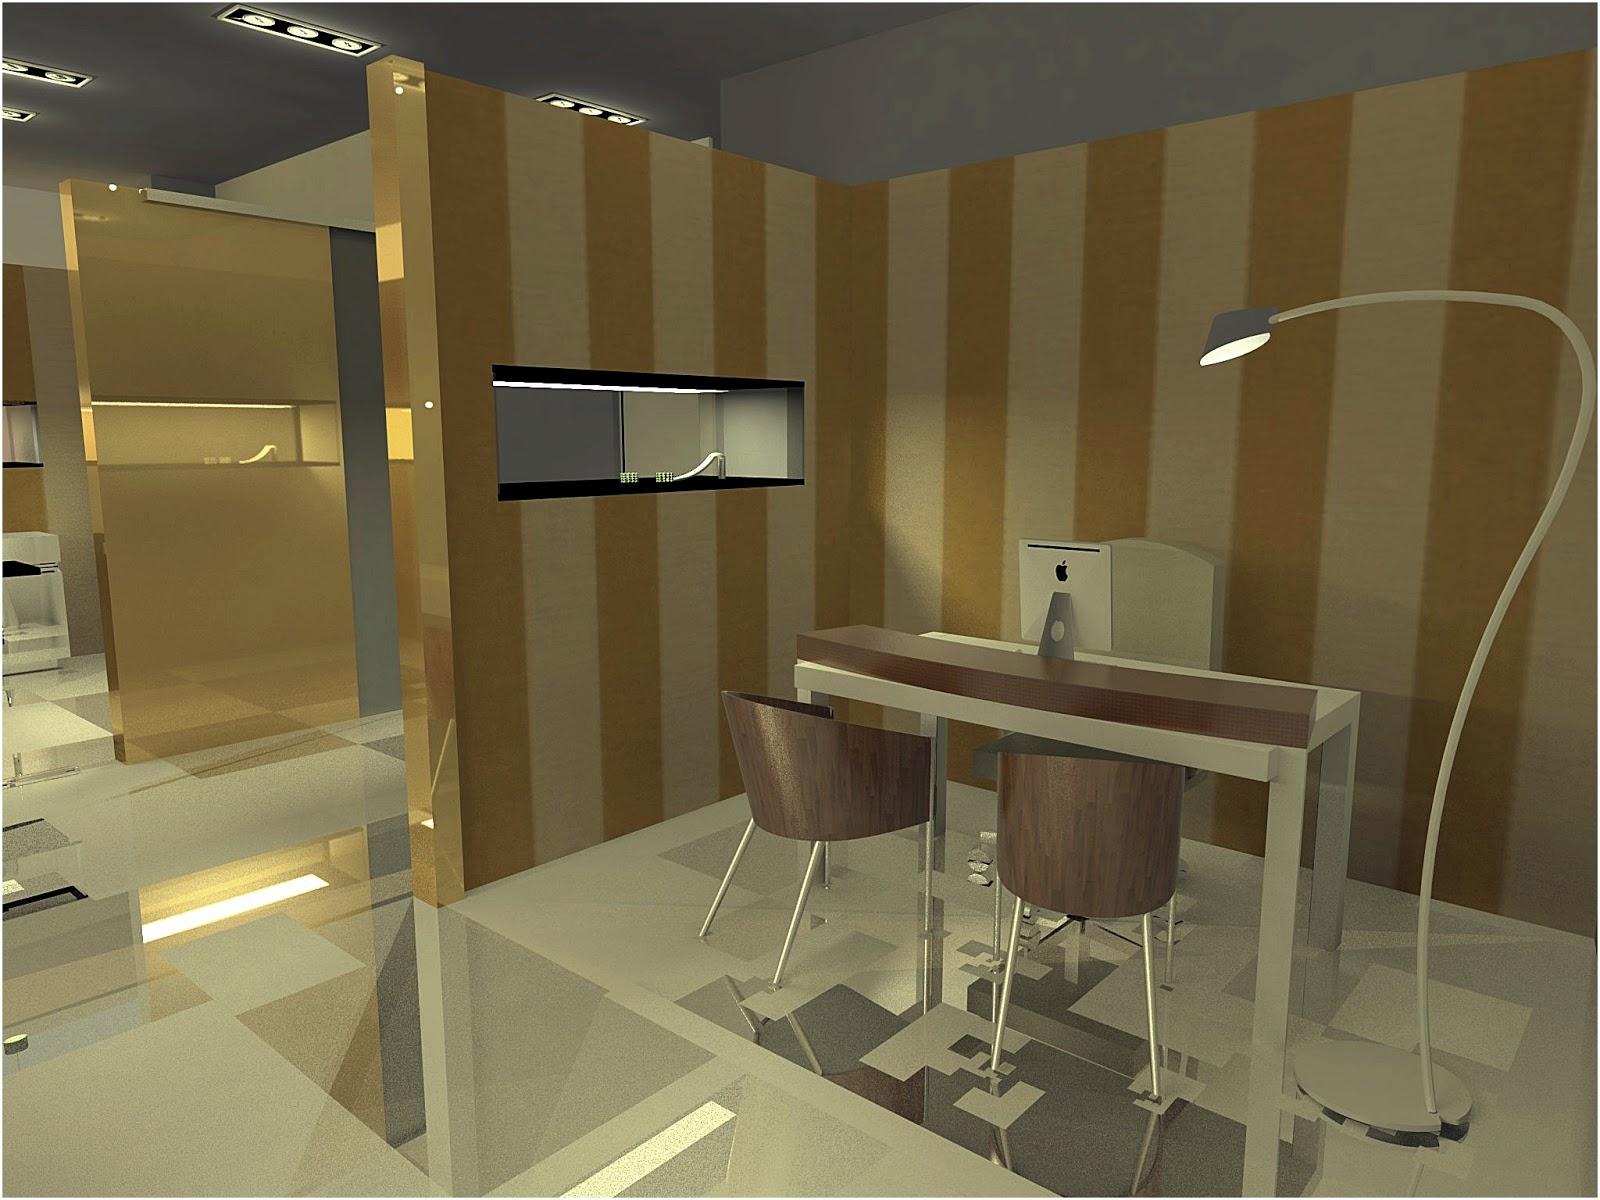 Dise o de interiores escuela de arte de motril 2013 04 21 - Trabajo de diseno de interiores ...